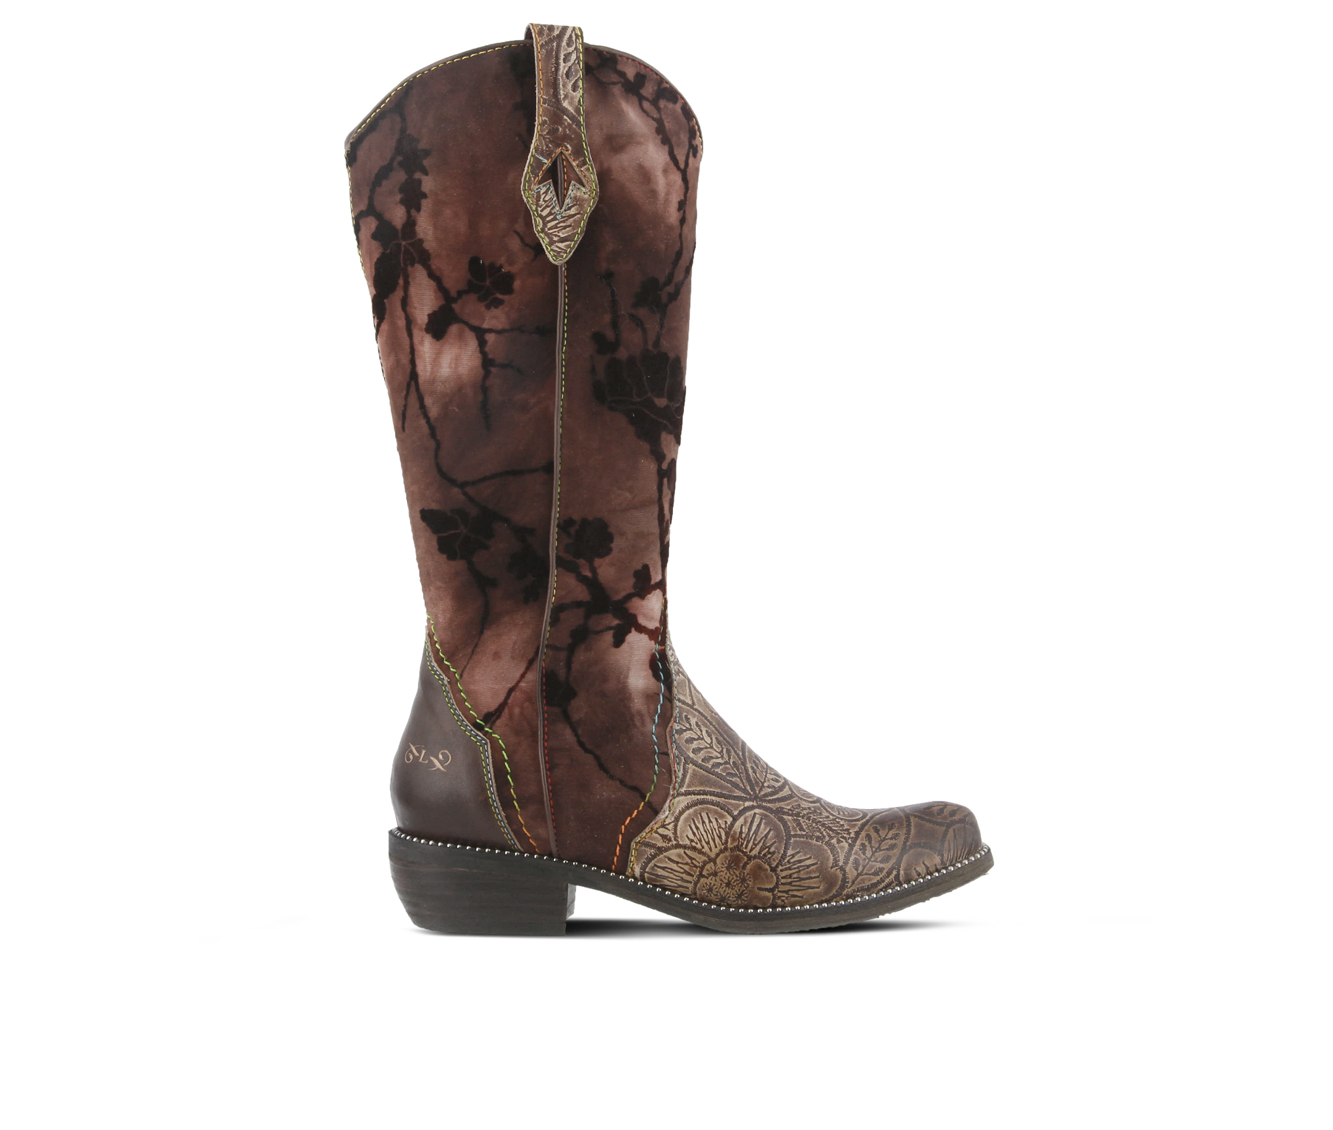 L'Artiste Laretilyn Women's Boots (Brown Leather)